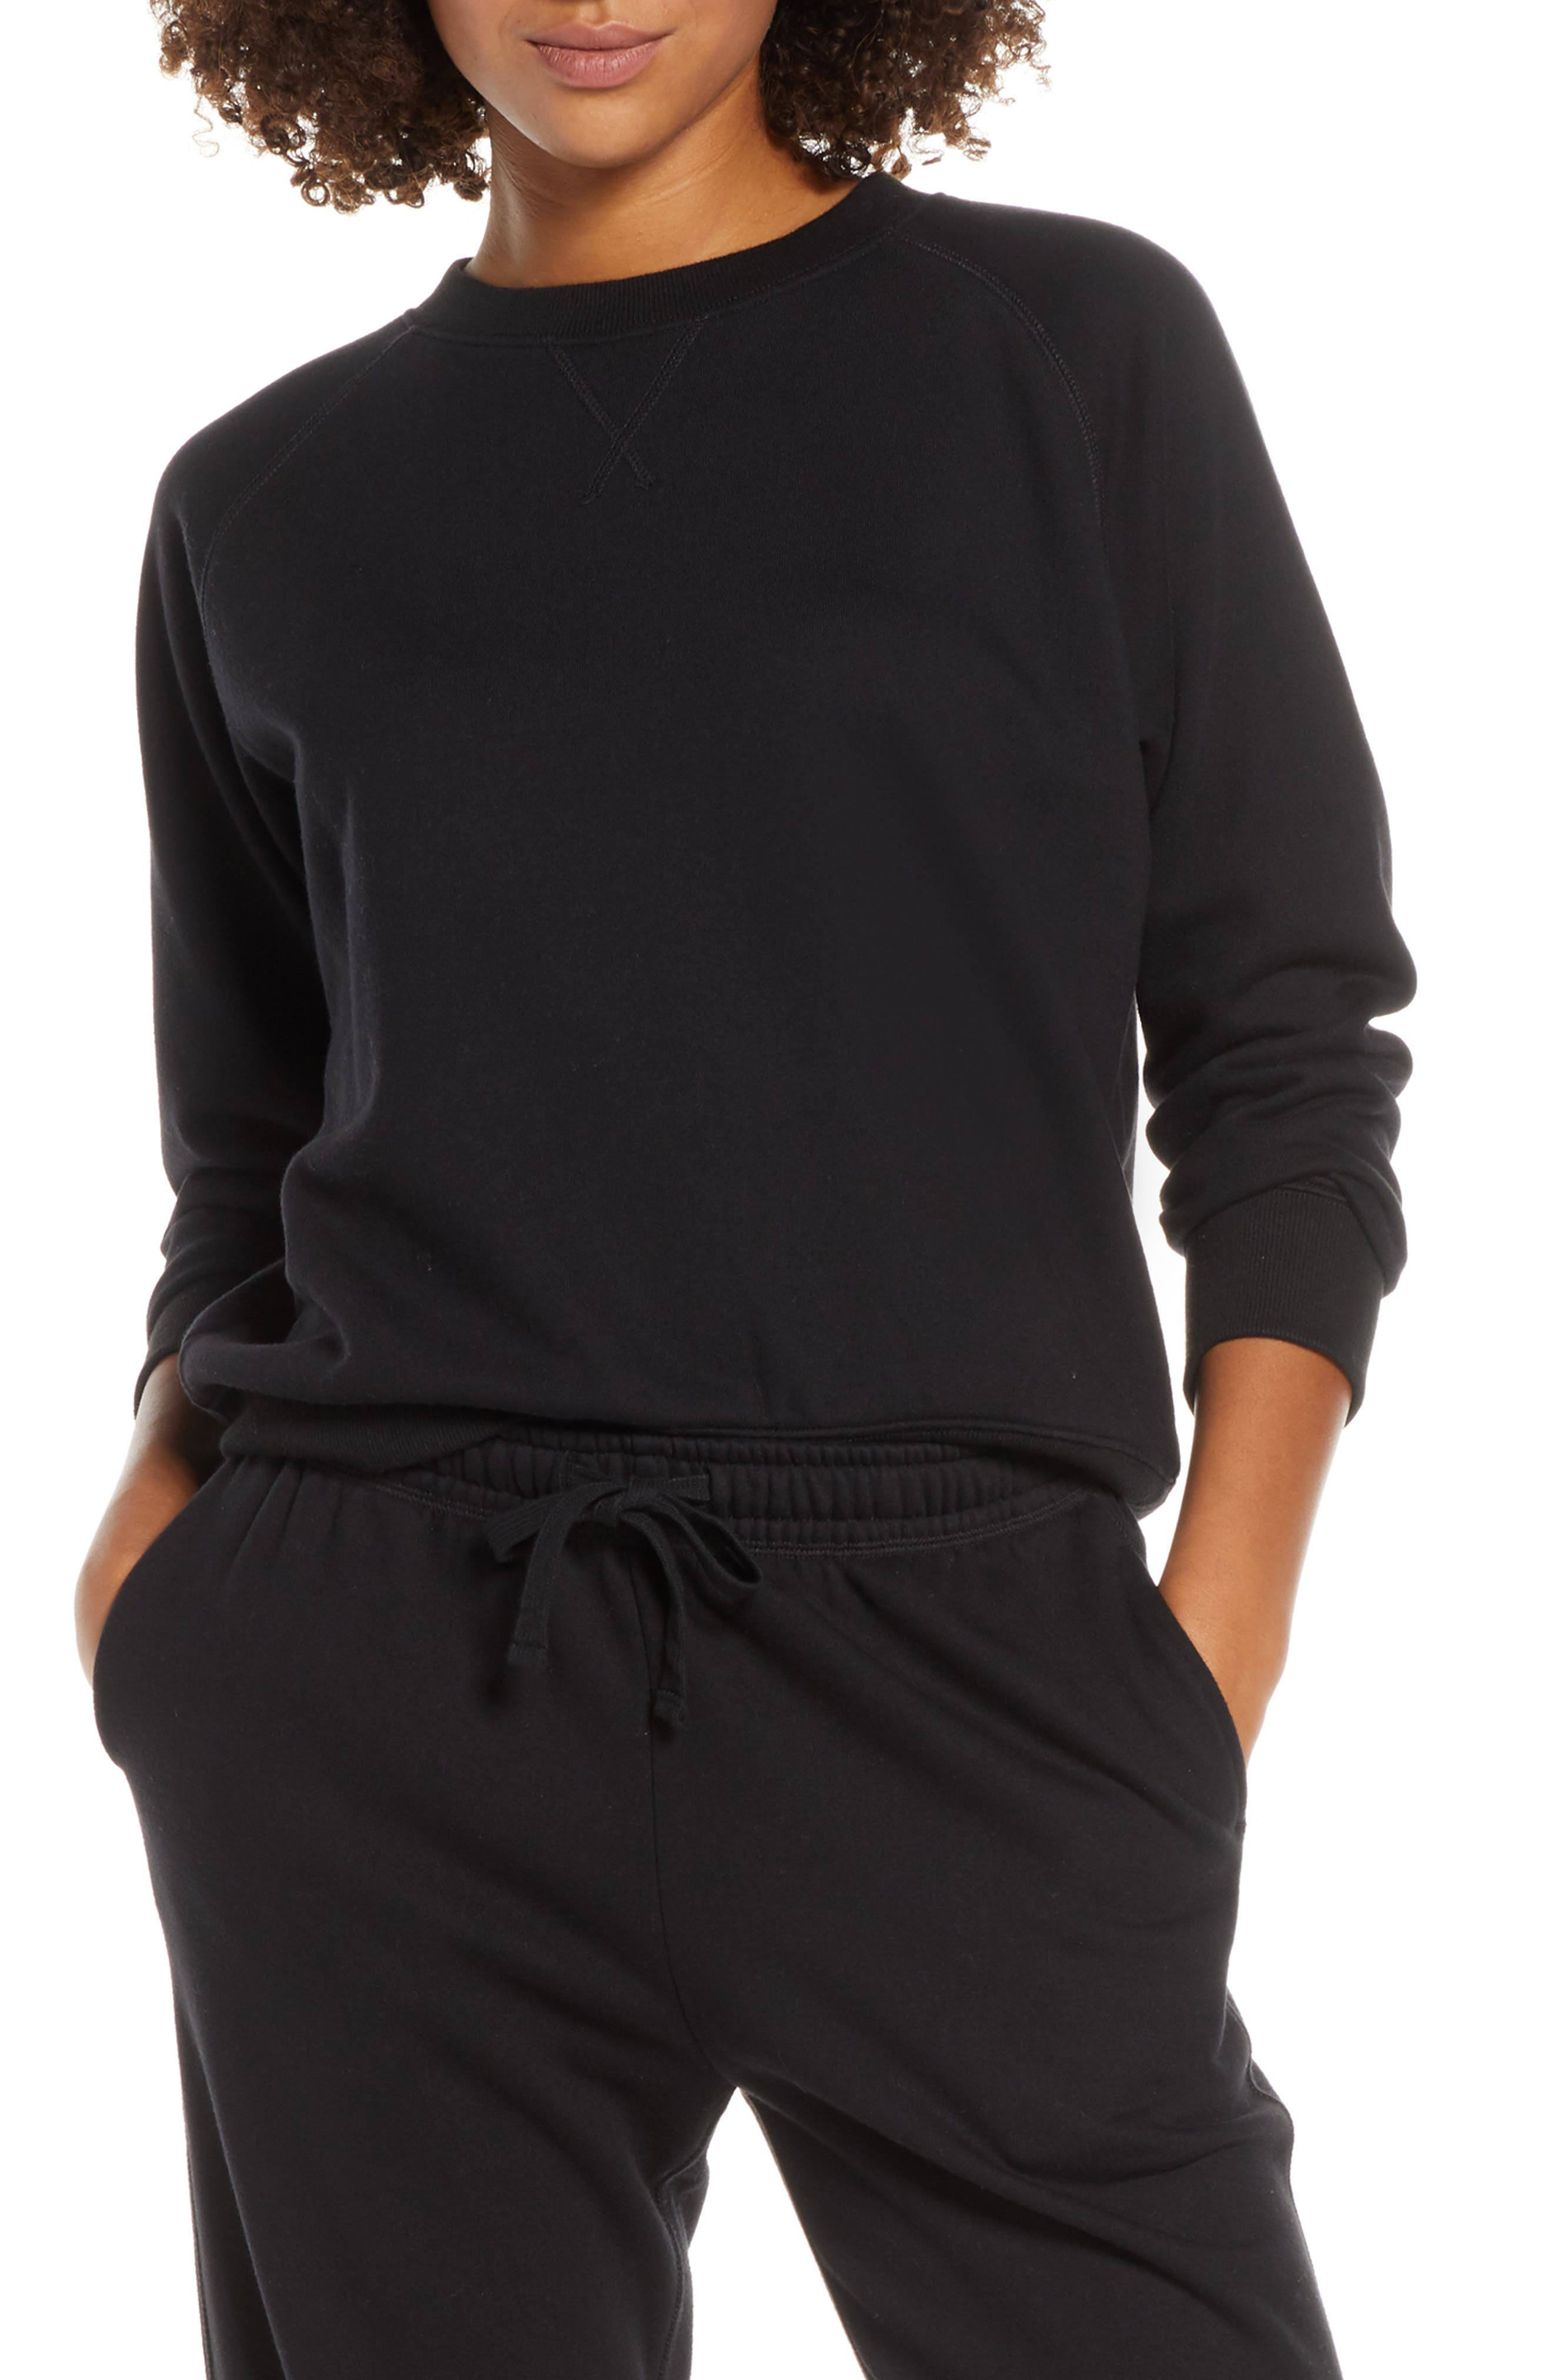 Richer Poorer Sweatshirt, Black